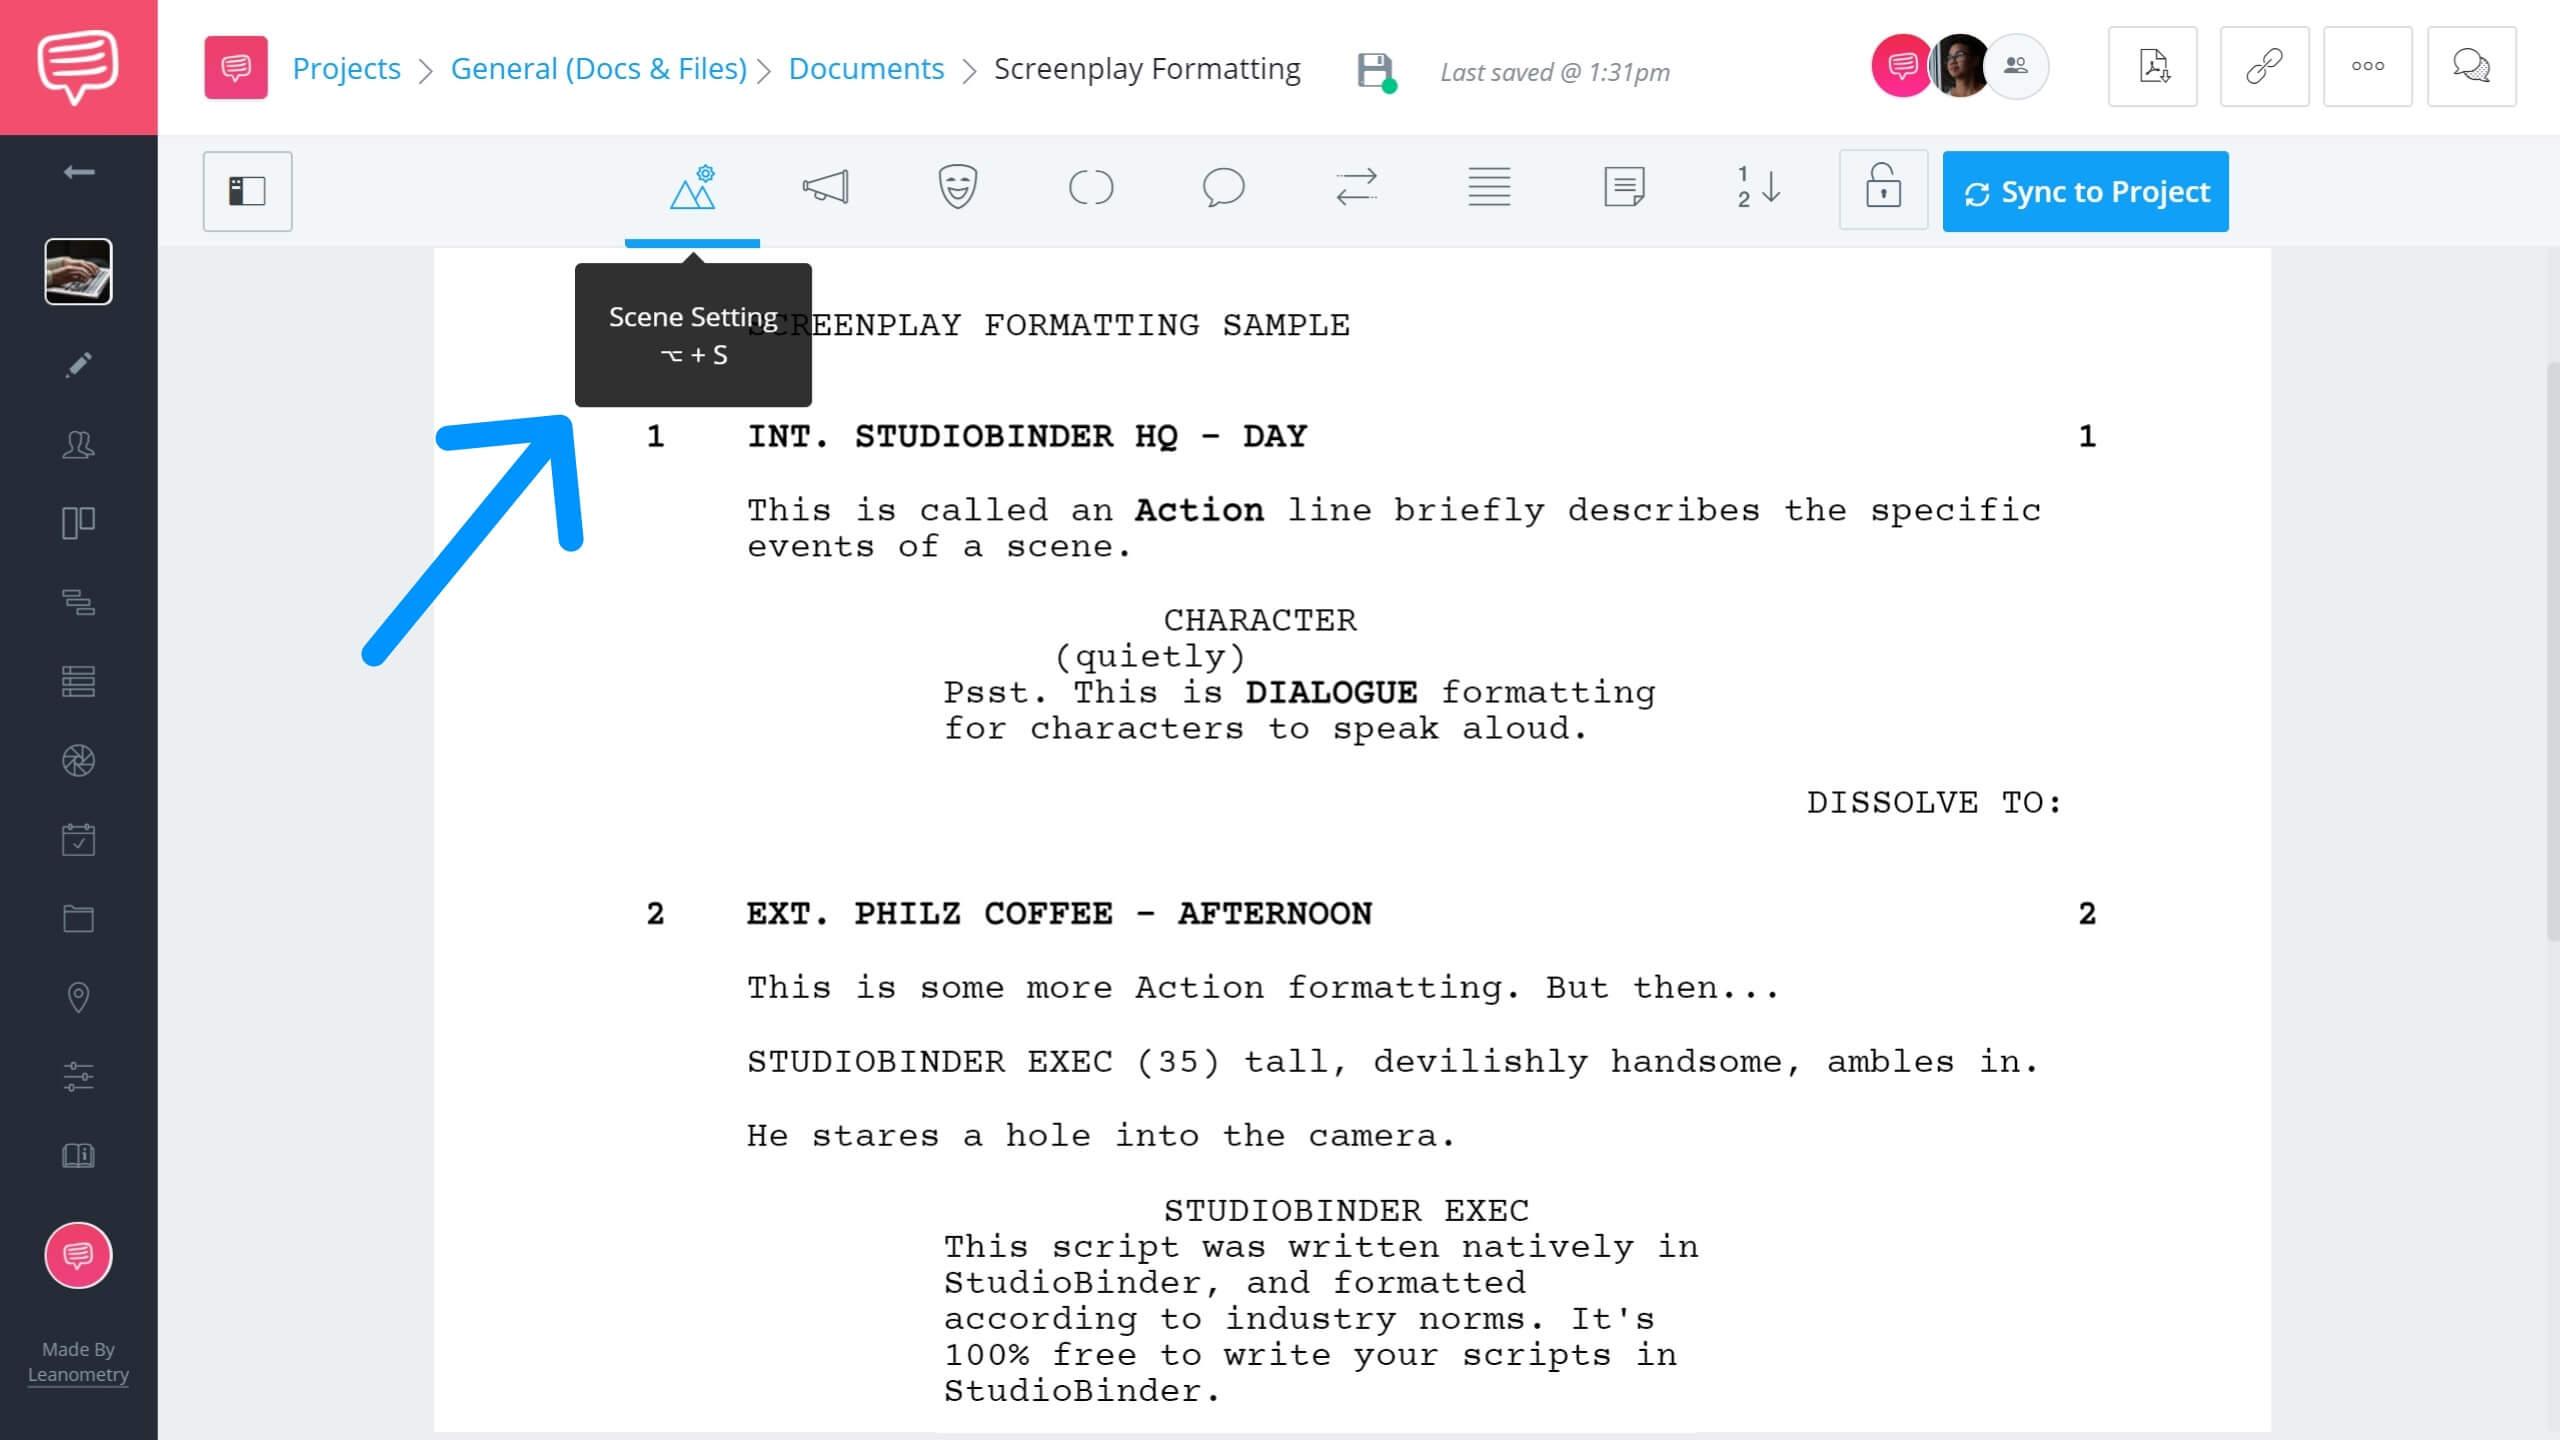 Best Screenwriting Contests - Scene Settings Example - StudioBinder Screenwriting Software